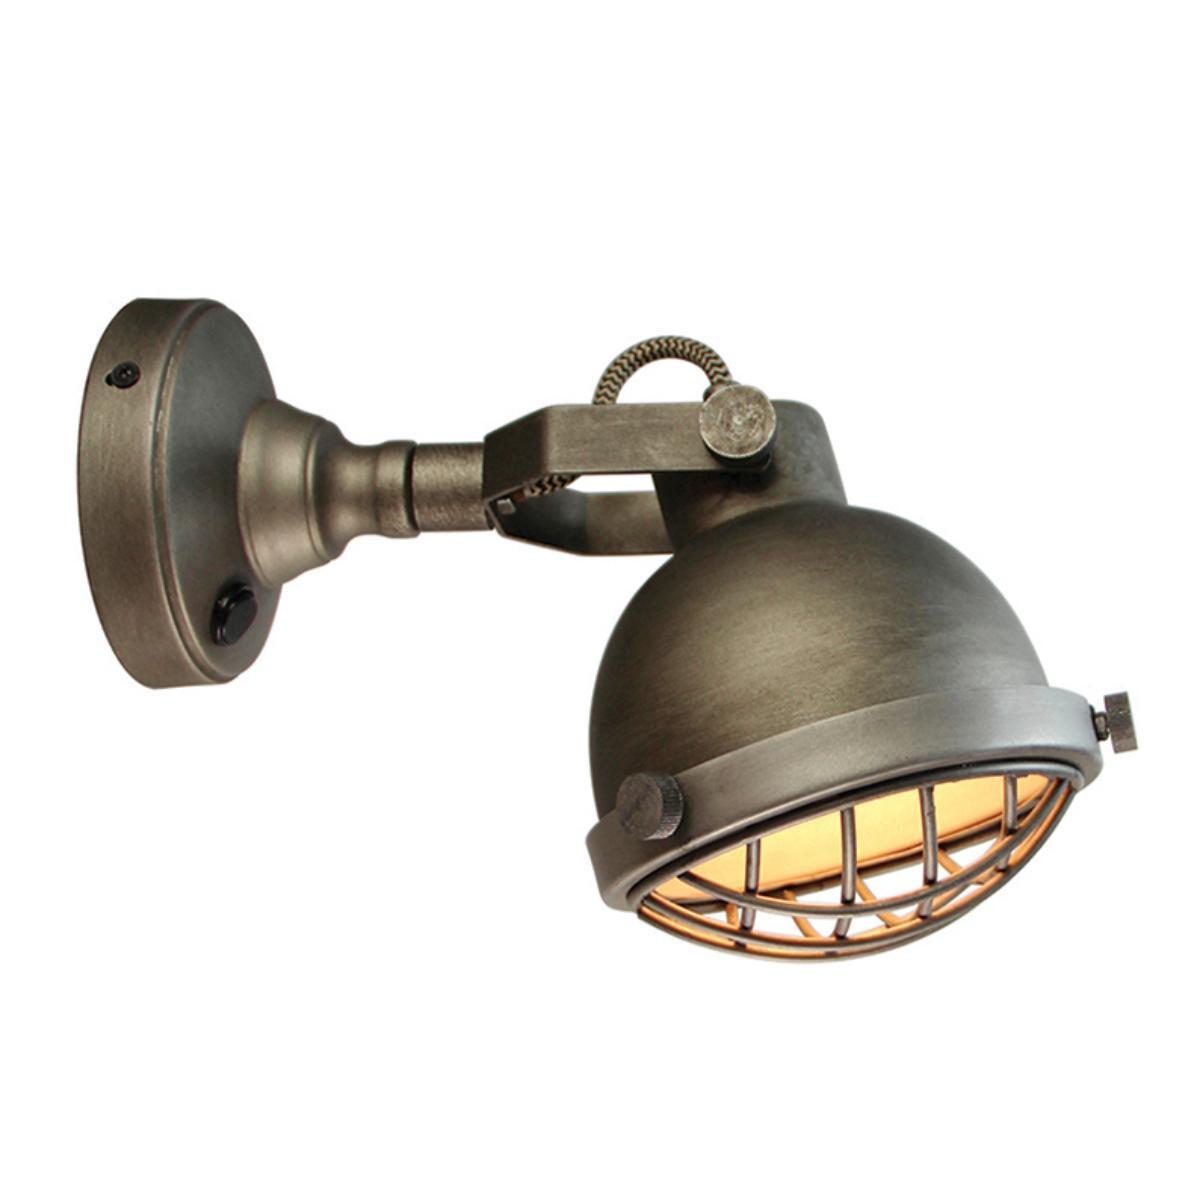 LABEL51 wandlamp 'Cas' LED, kleur Burned Steel